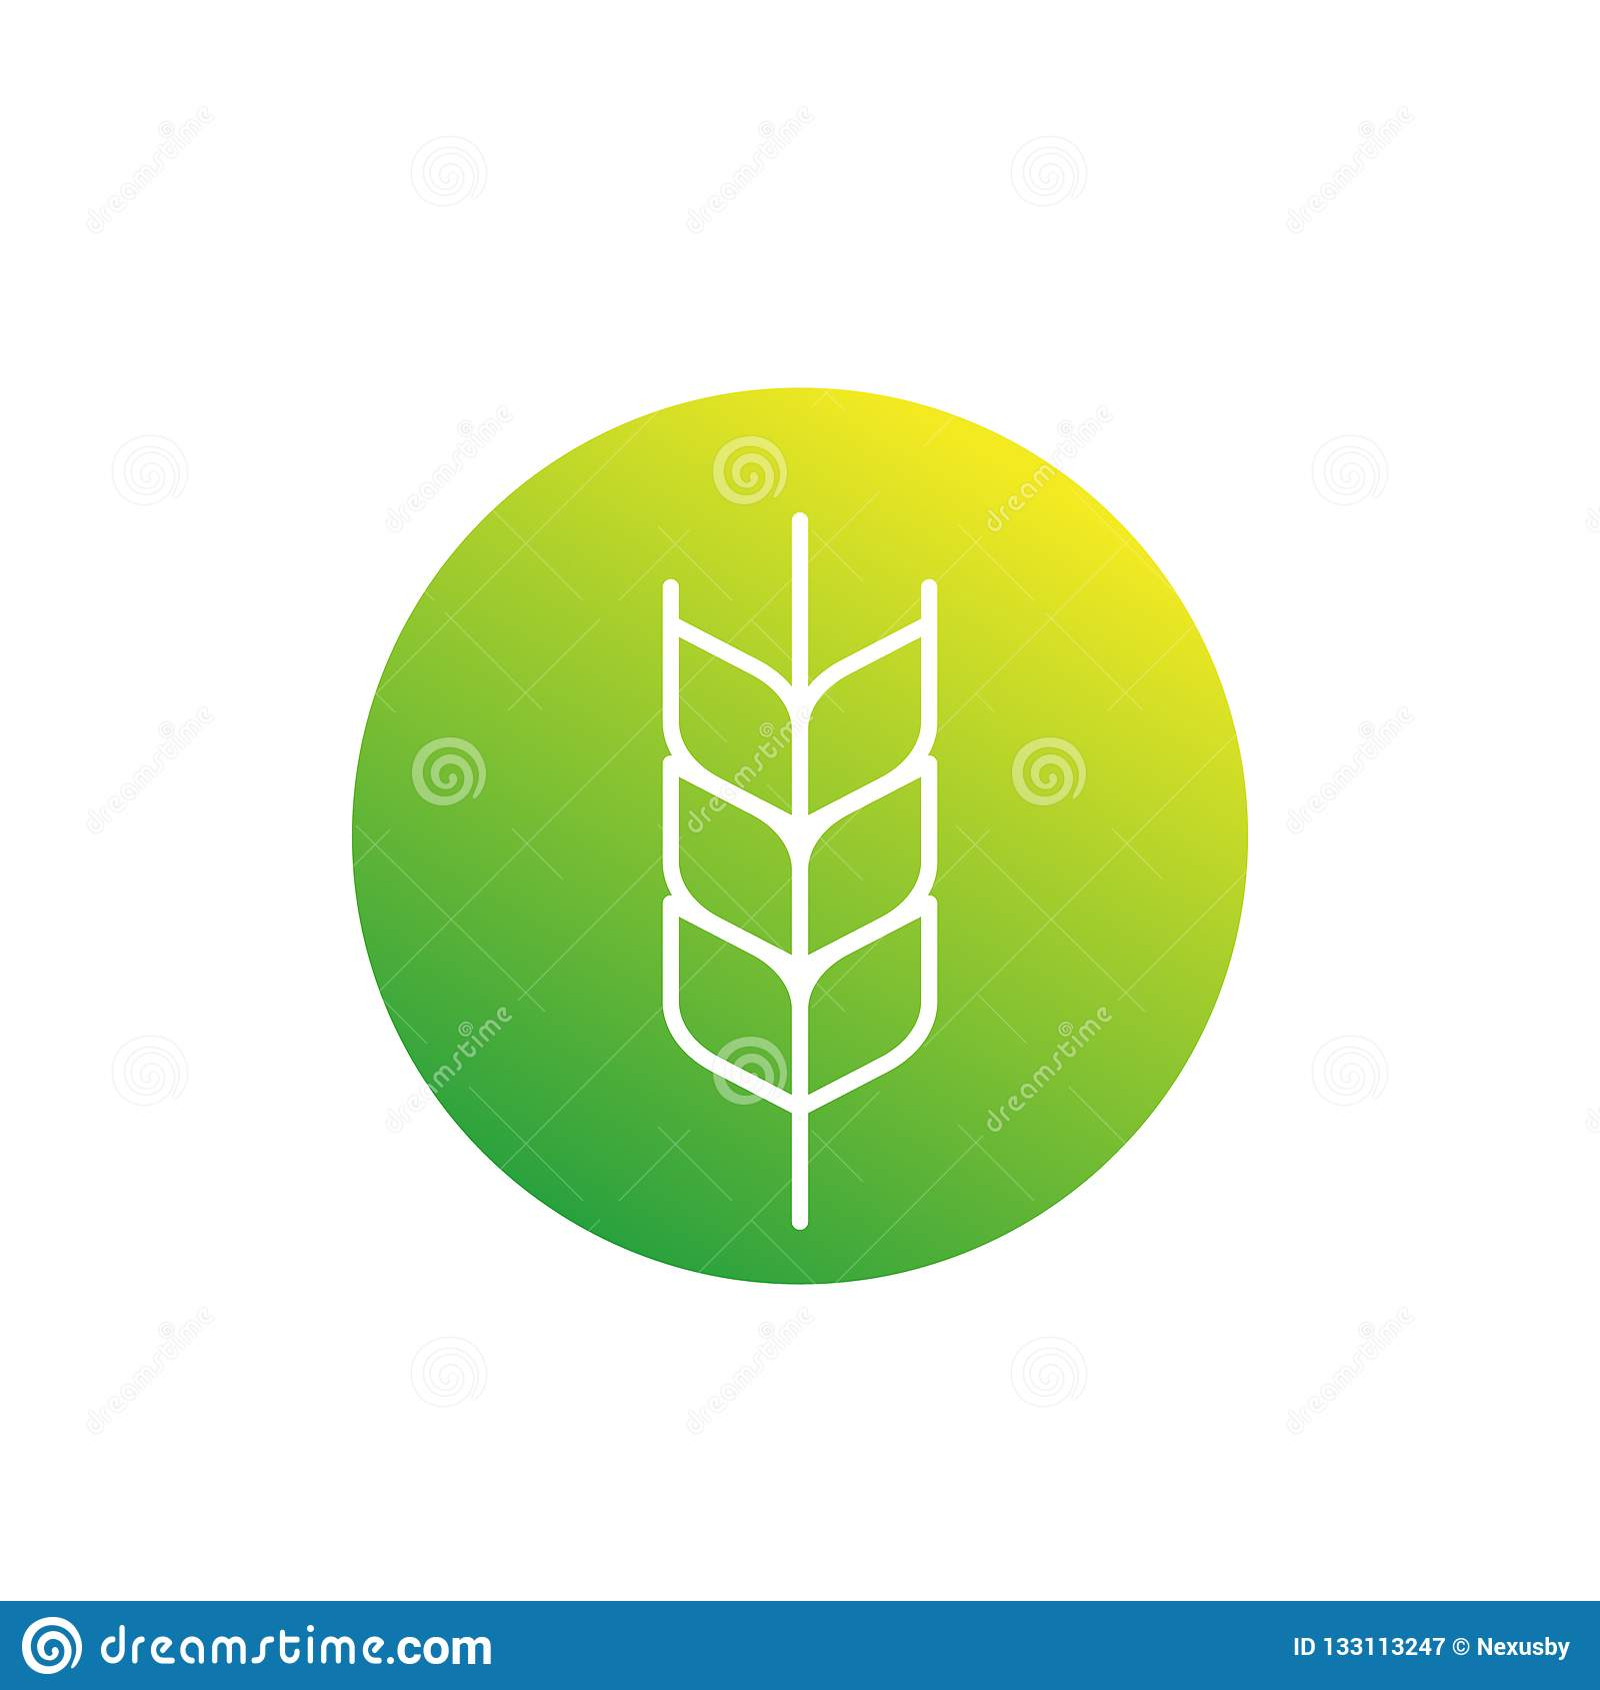 Weizenikone, linear